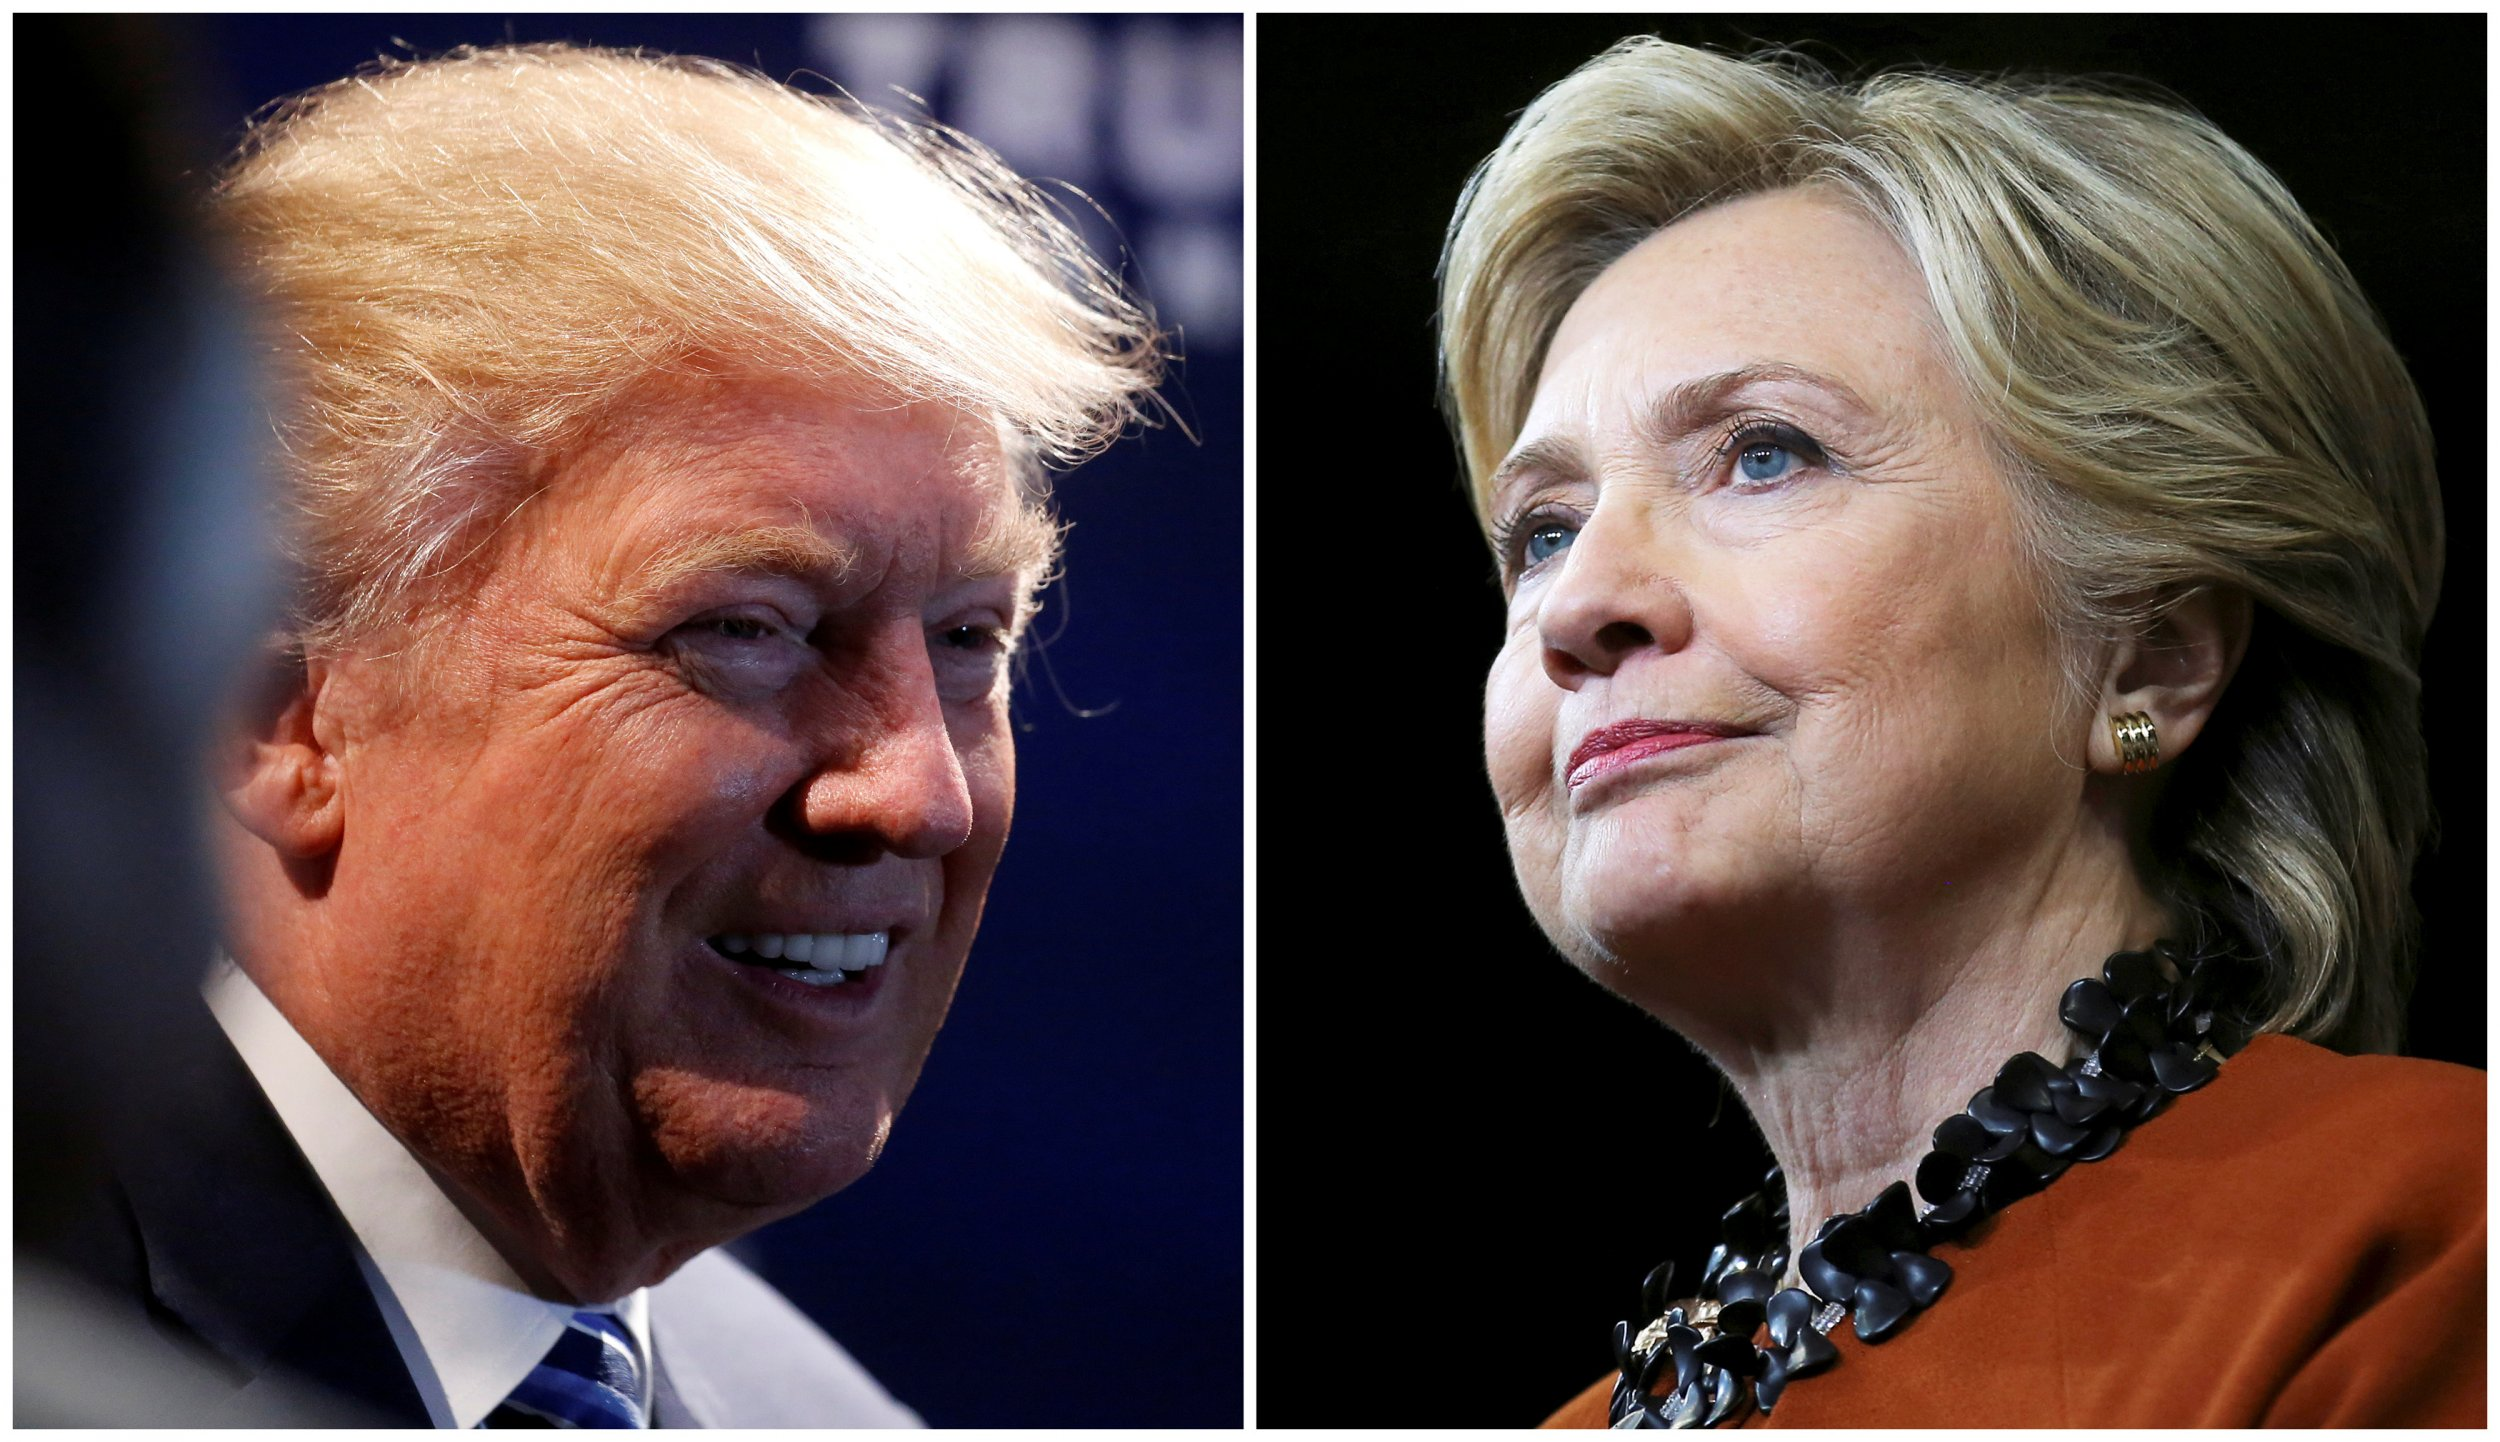 Donald Trump, Hillary Clinton 2016